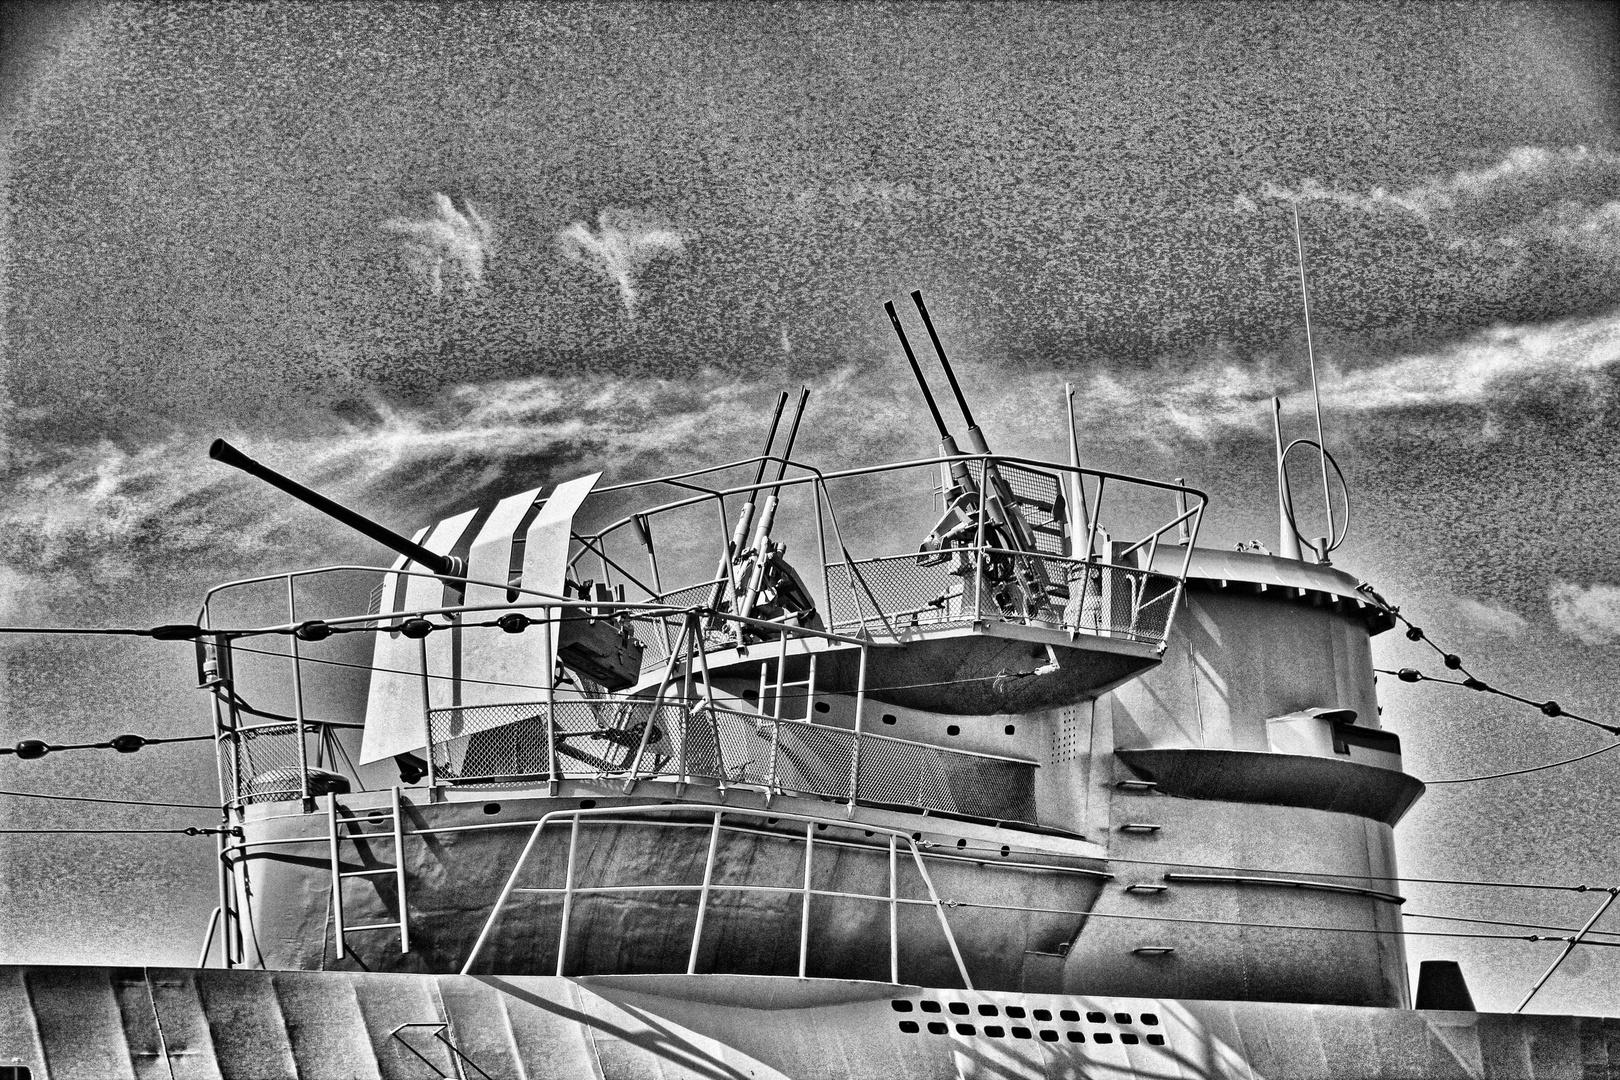 Das verlorene U-Boot - Flakturm